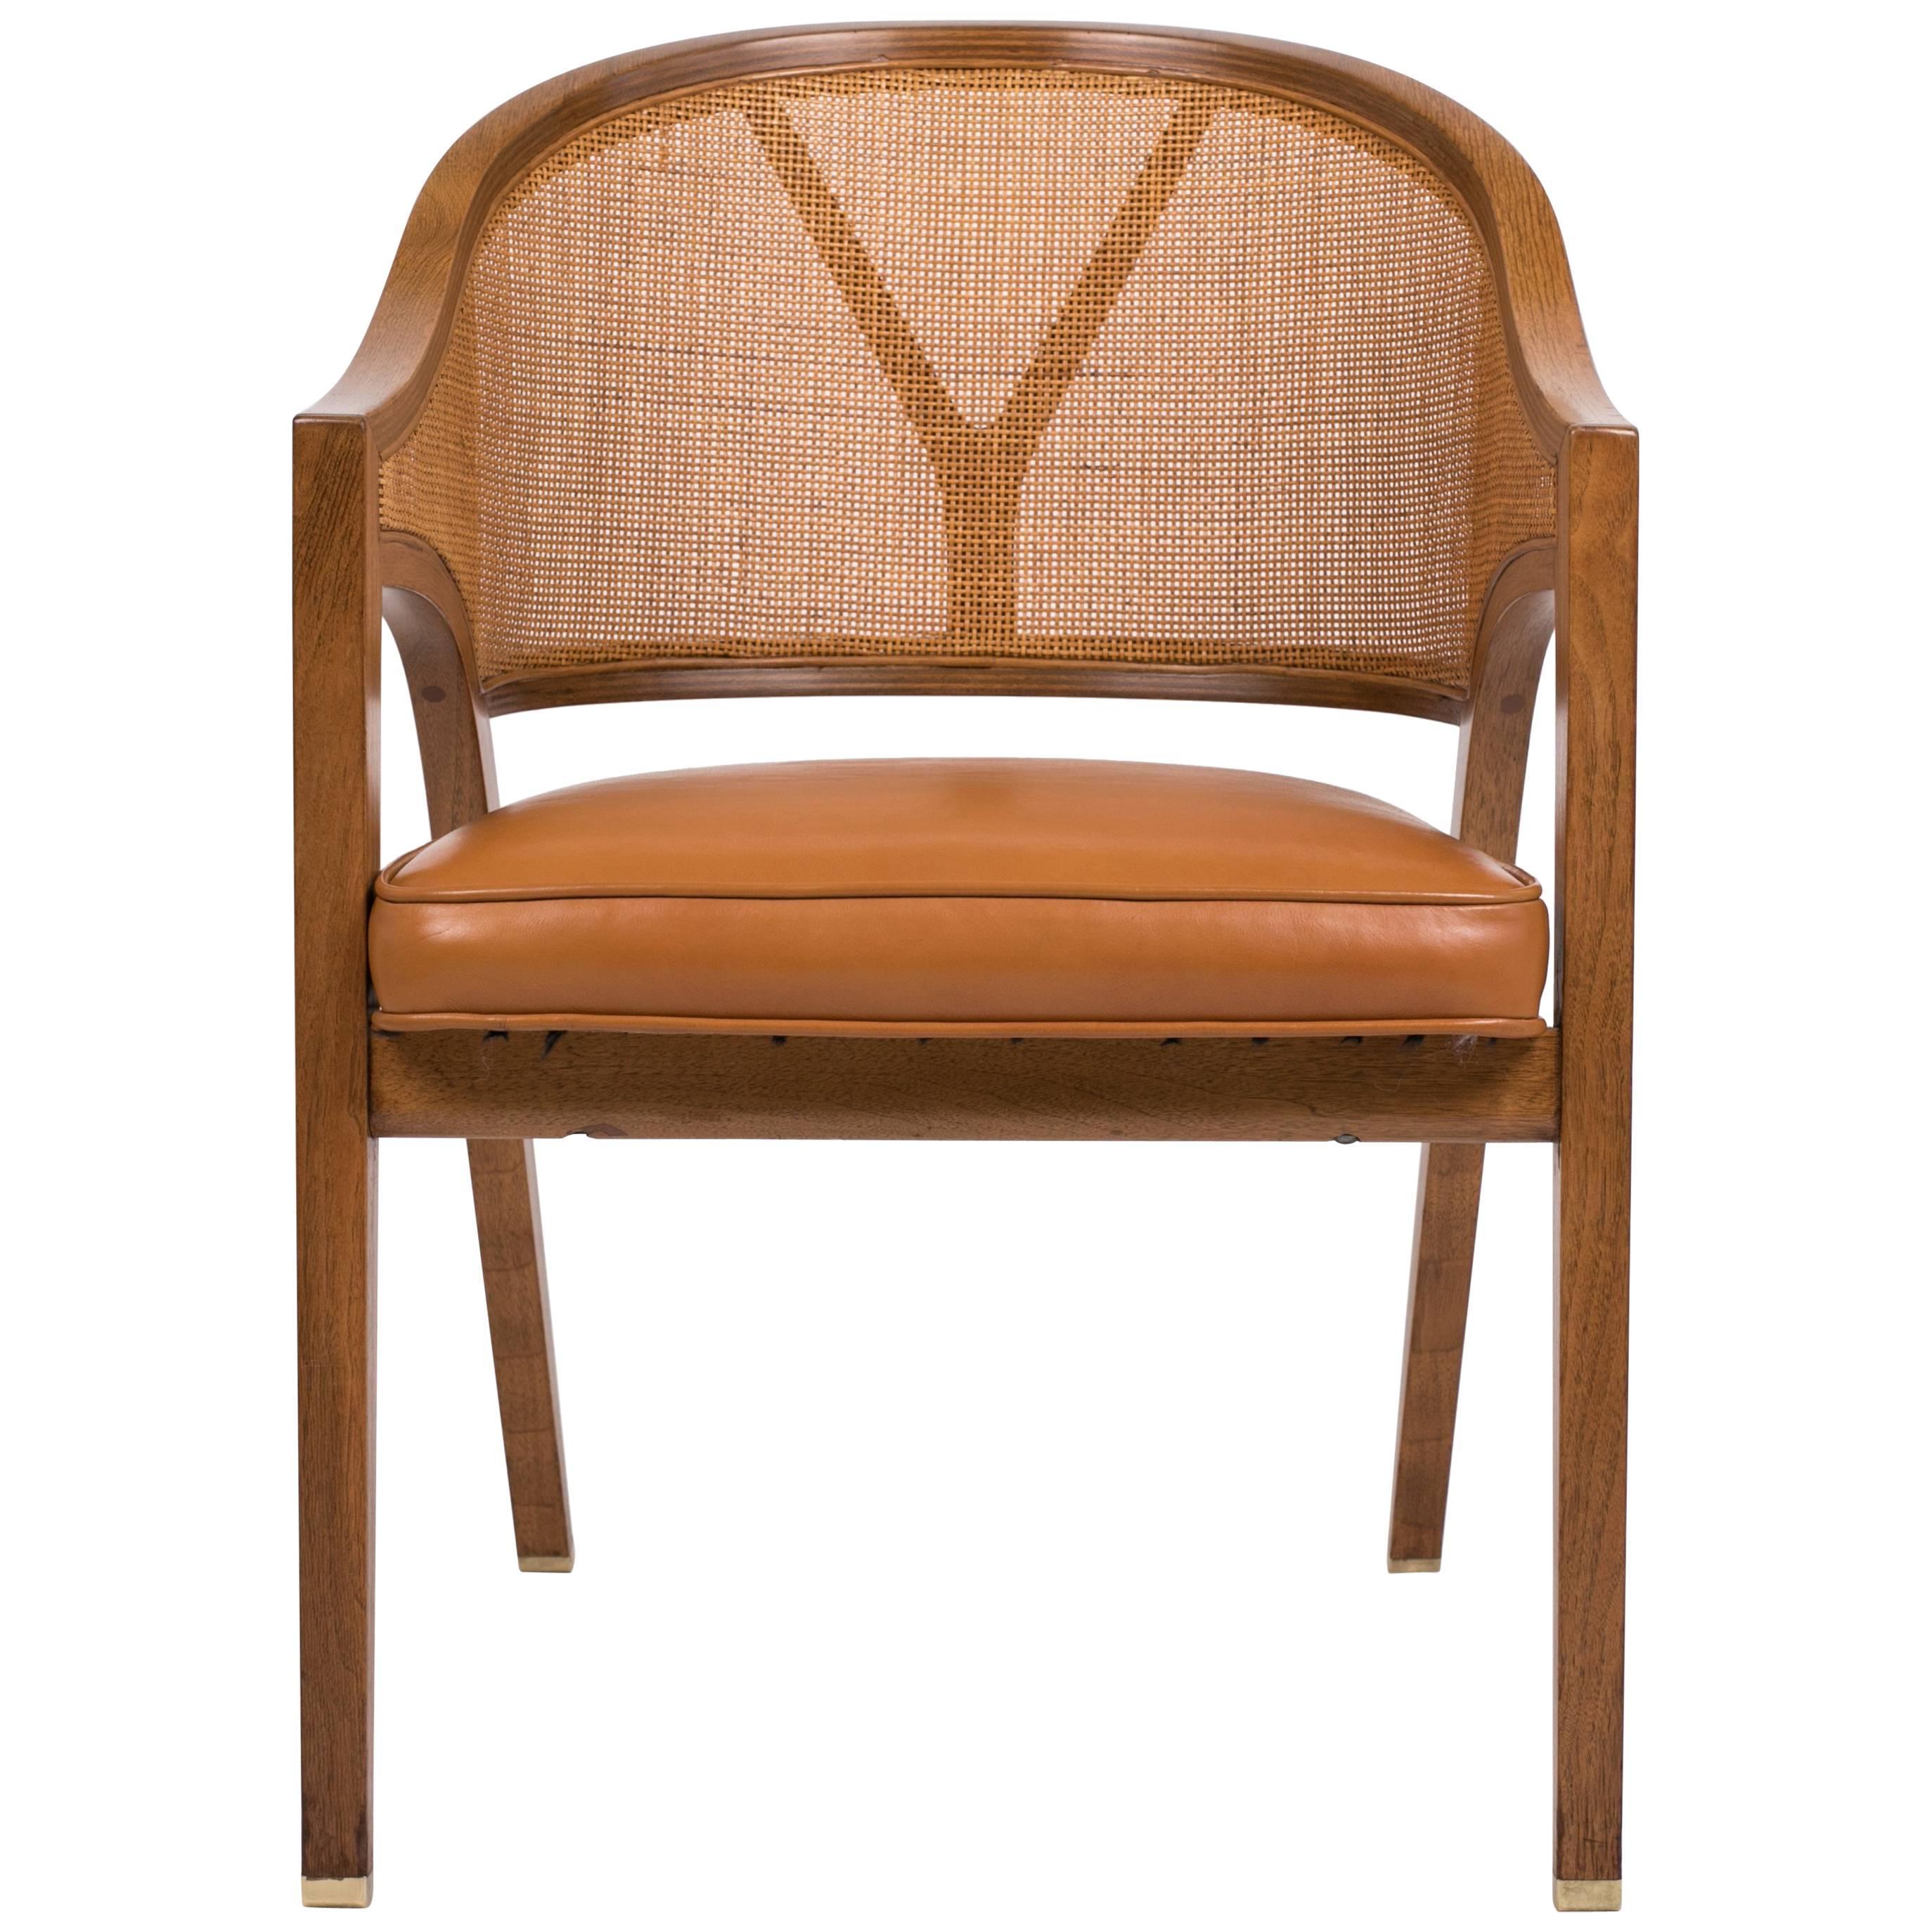 edward wormley for dunbar yback captain chair in woven cane and walnut